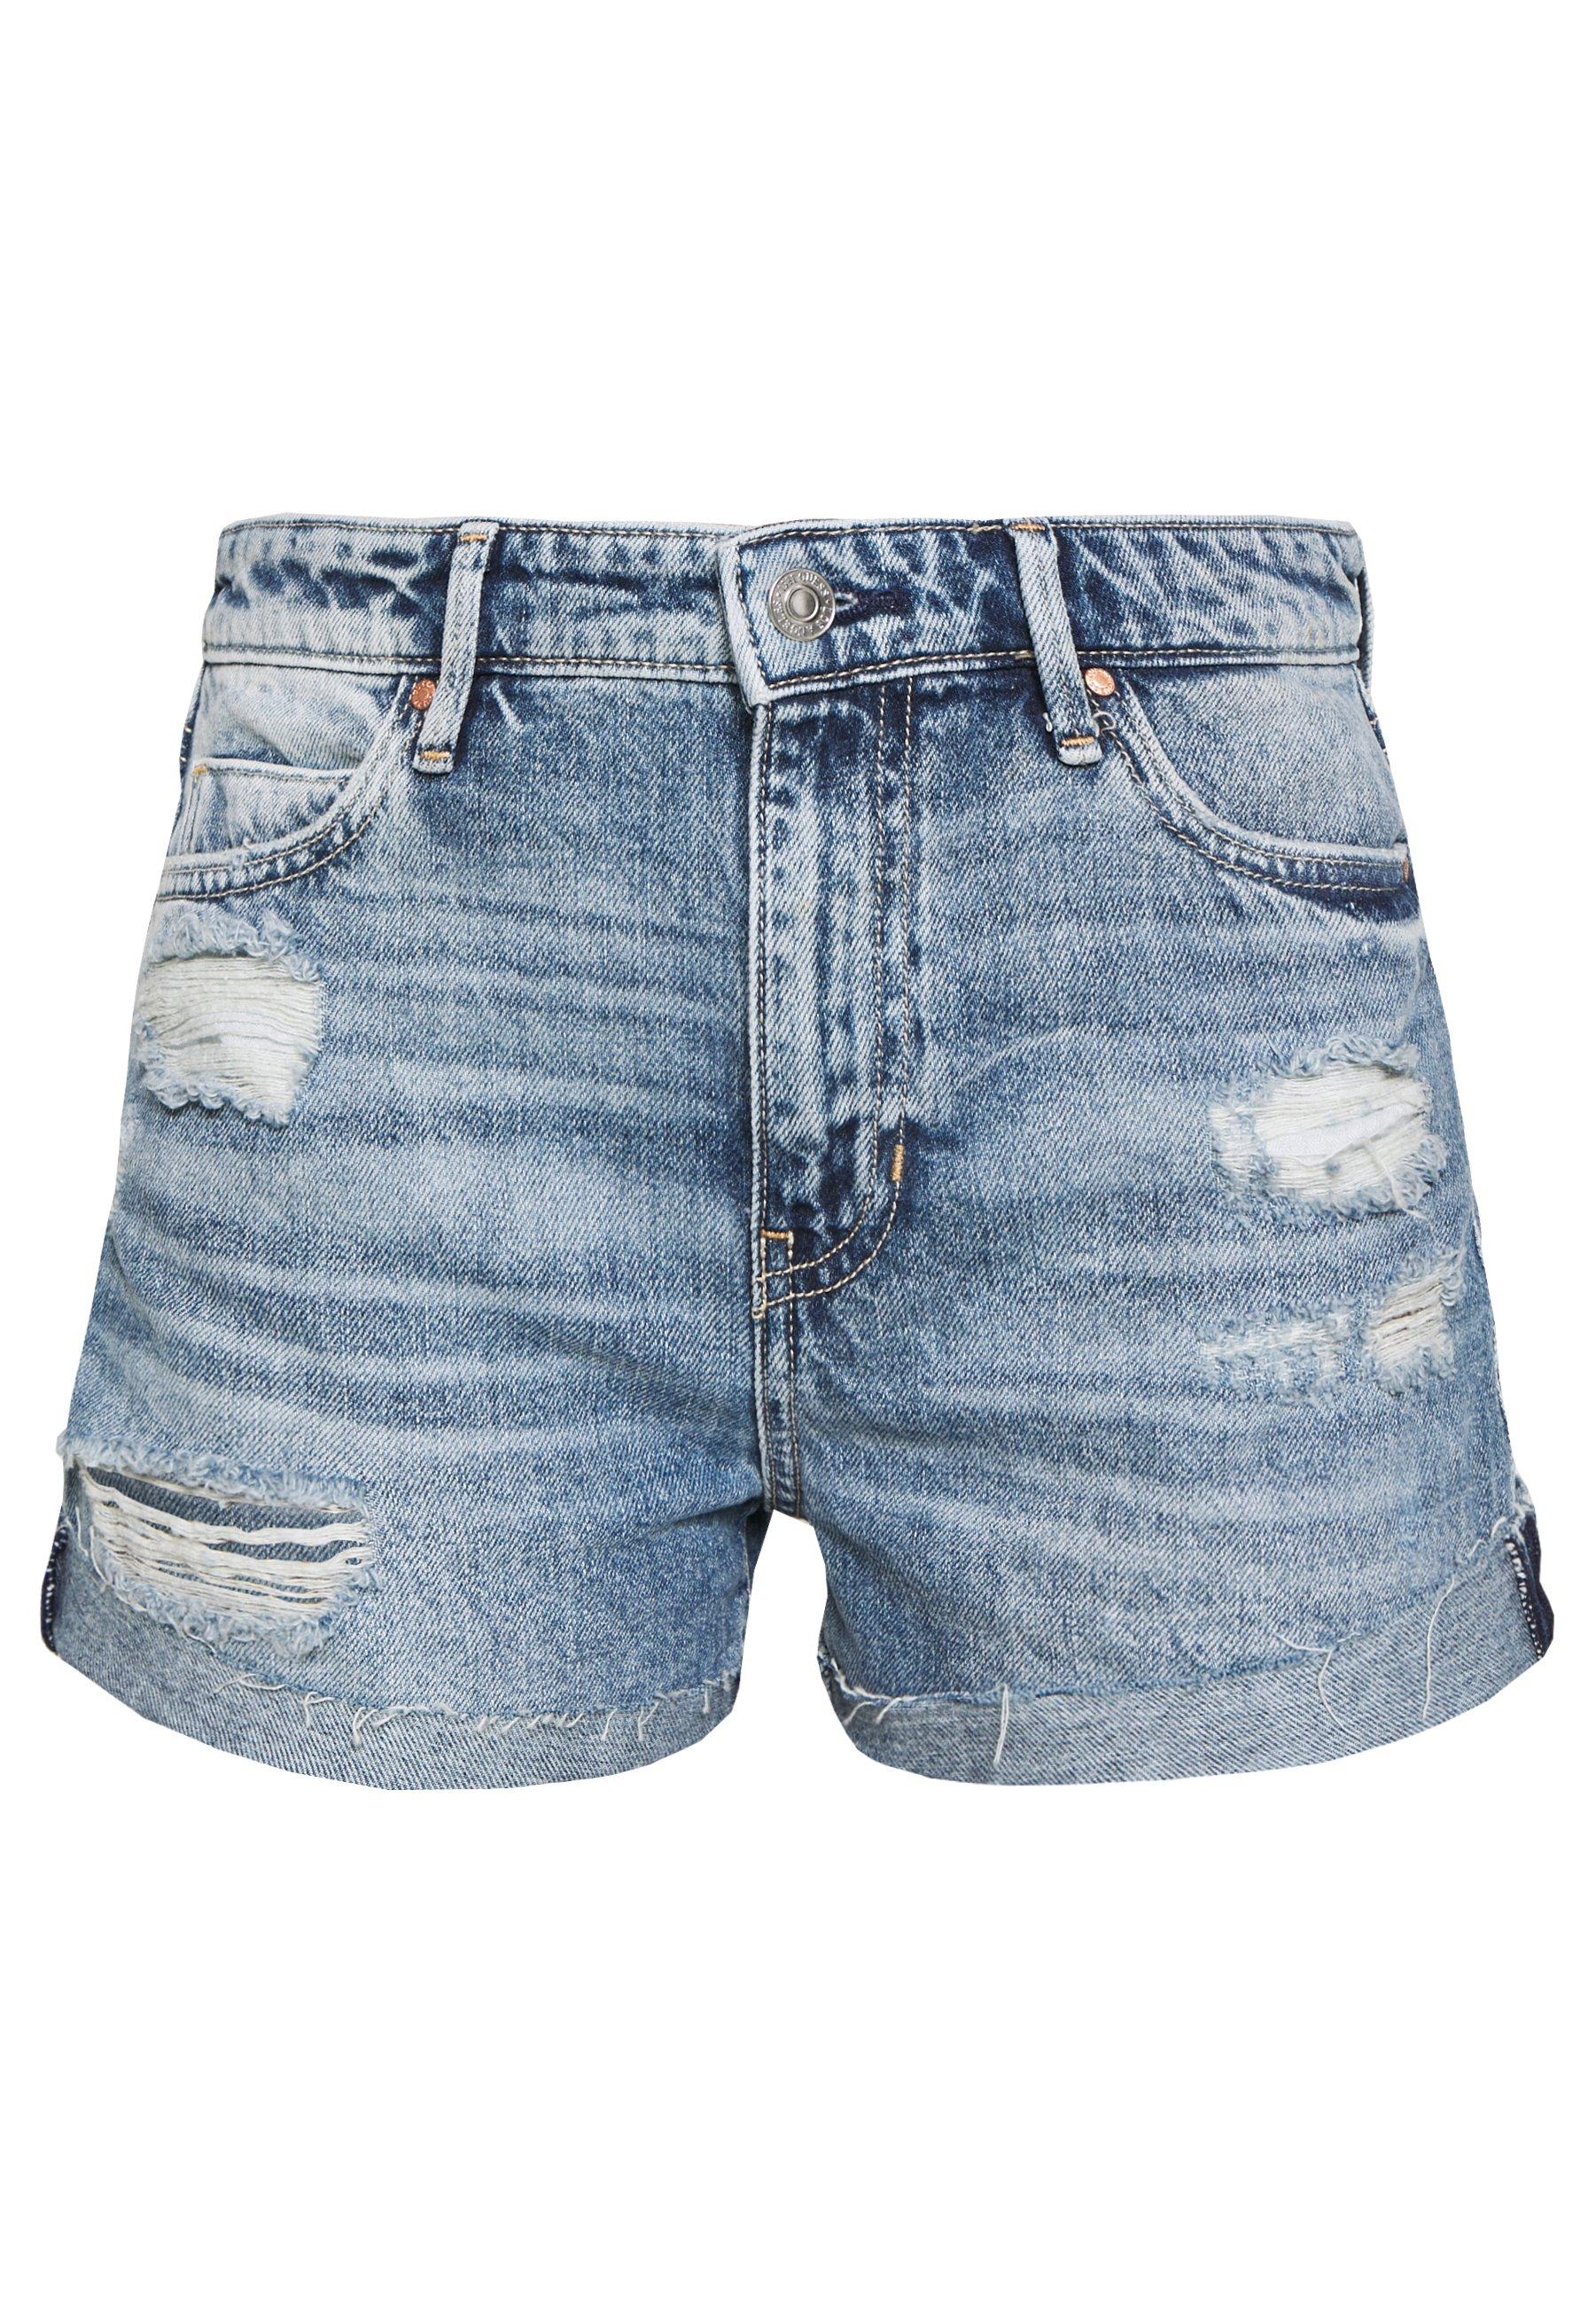 Guess GEMMA Shorts di jeans tomorrow blue Zalando.it